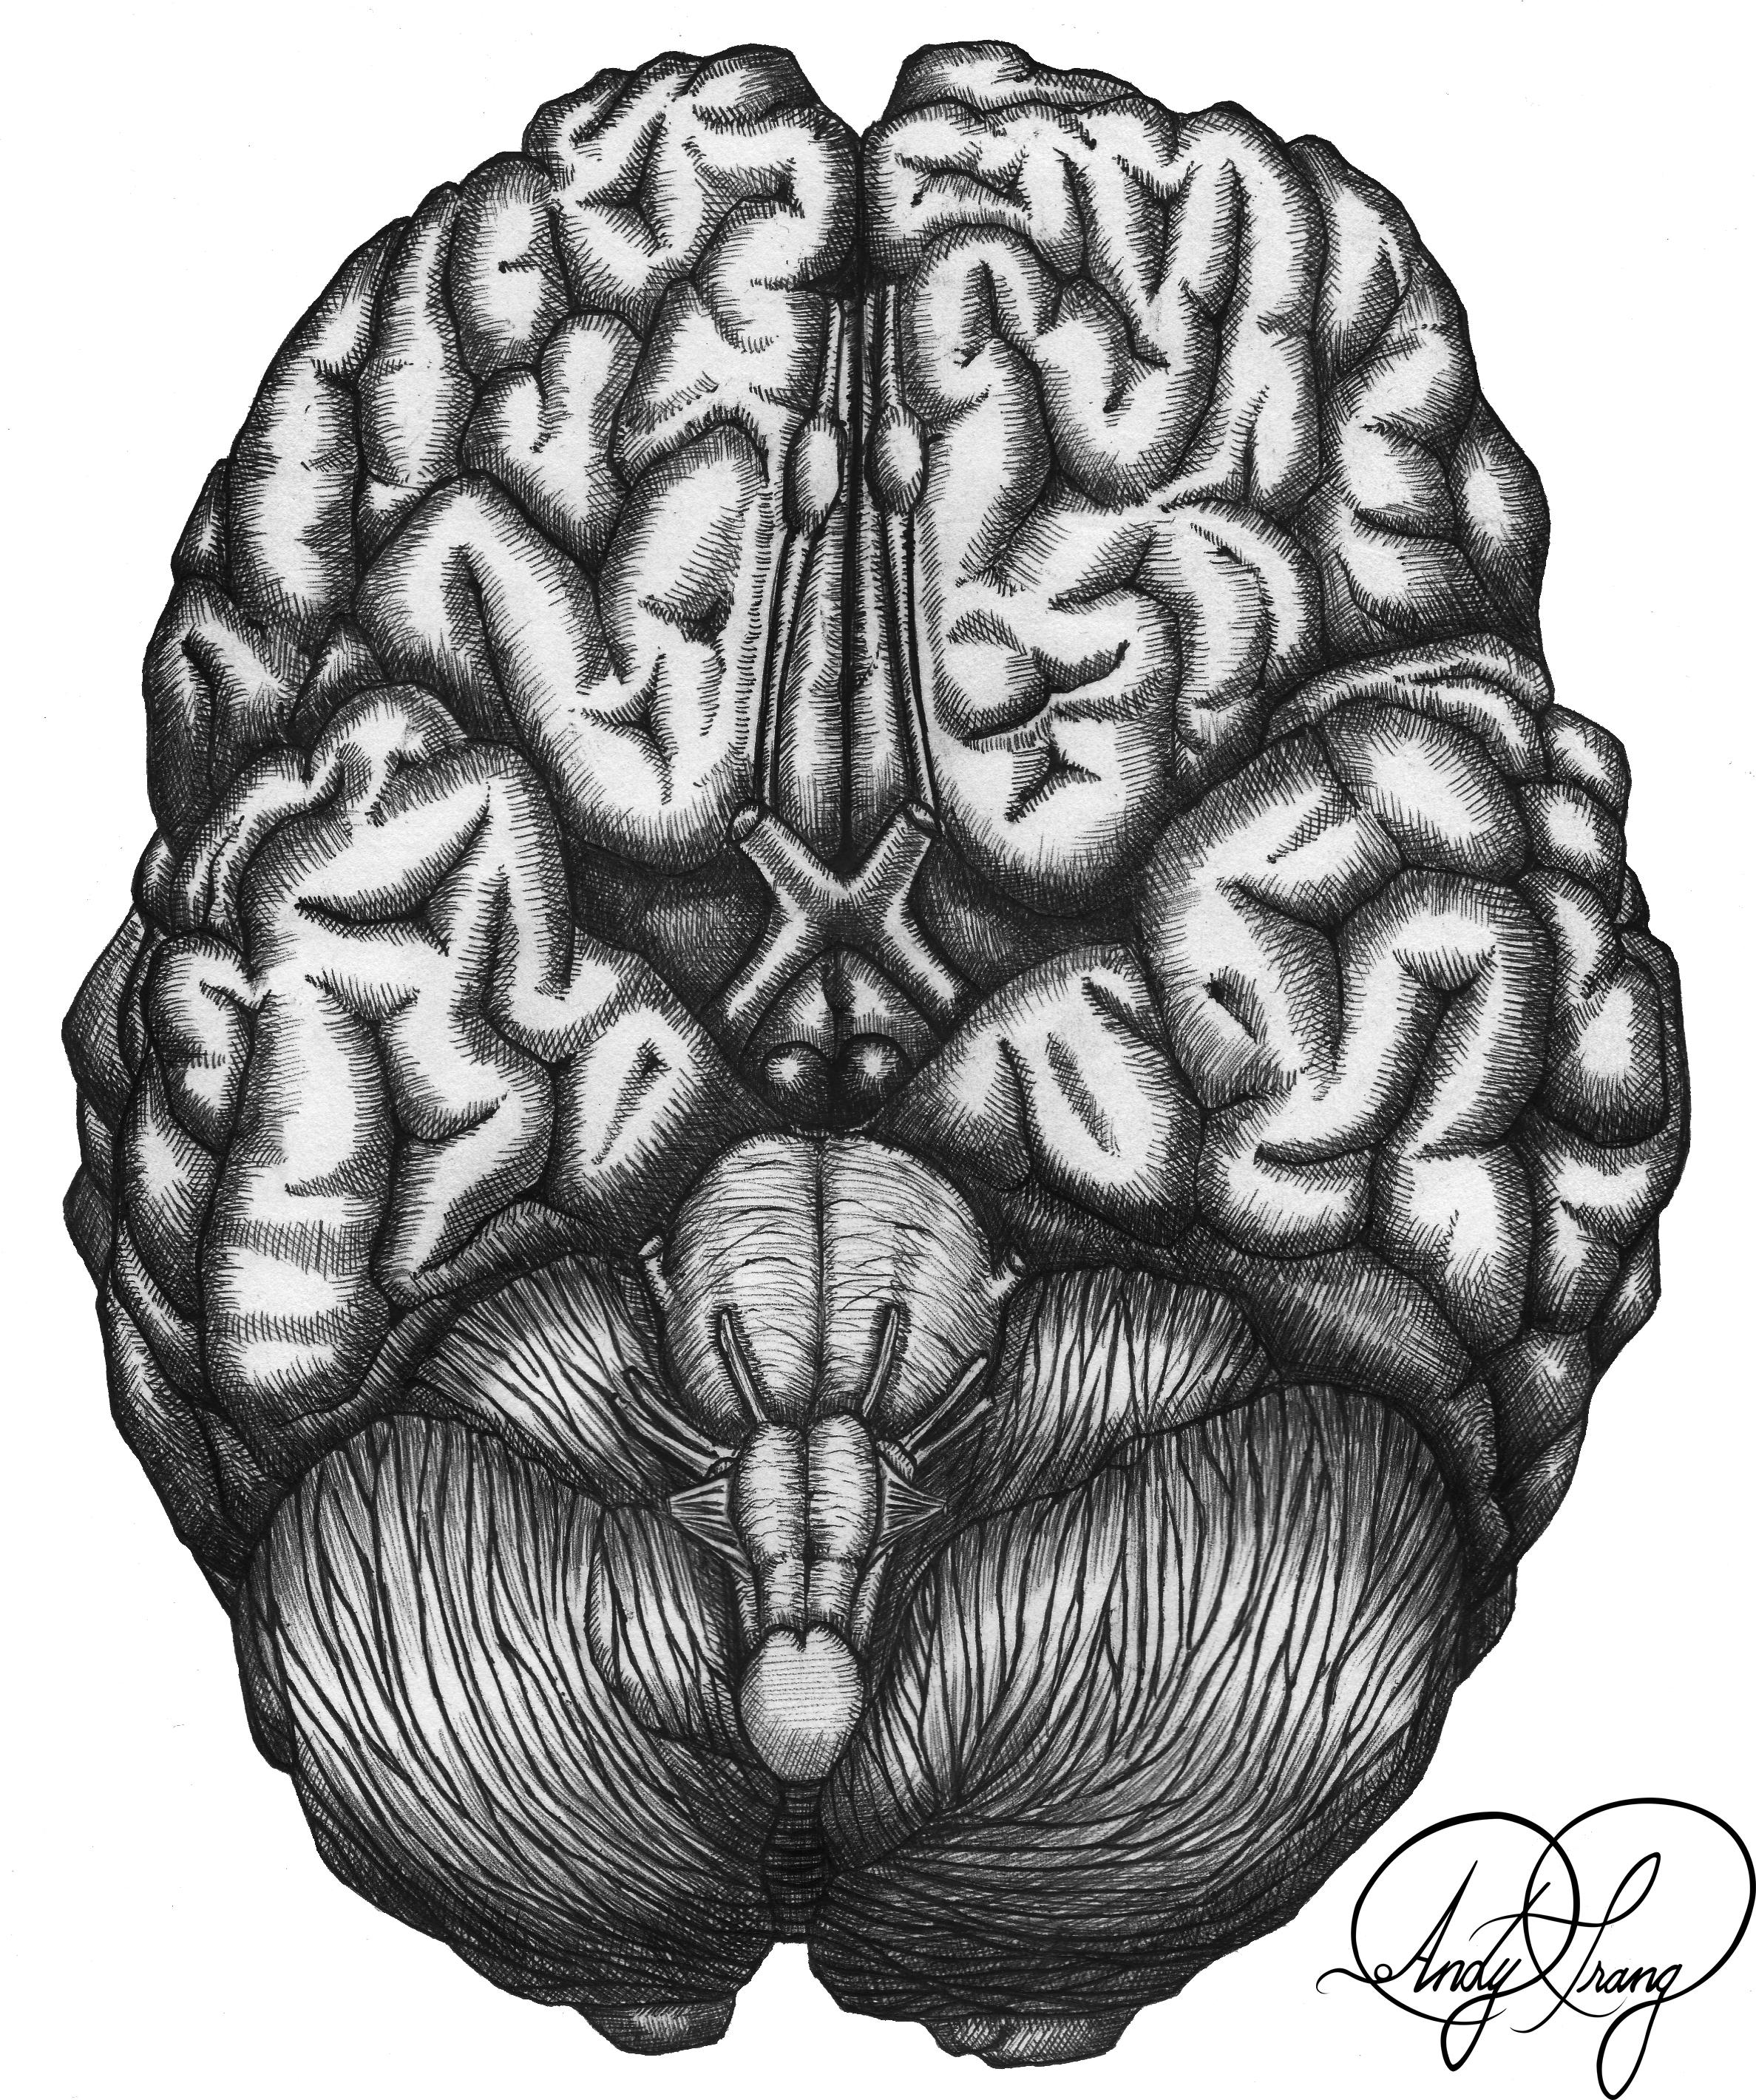 Andy_Trang-Brain_inferior.png